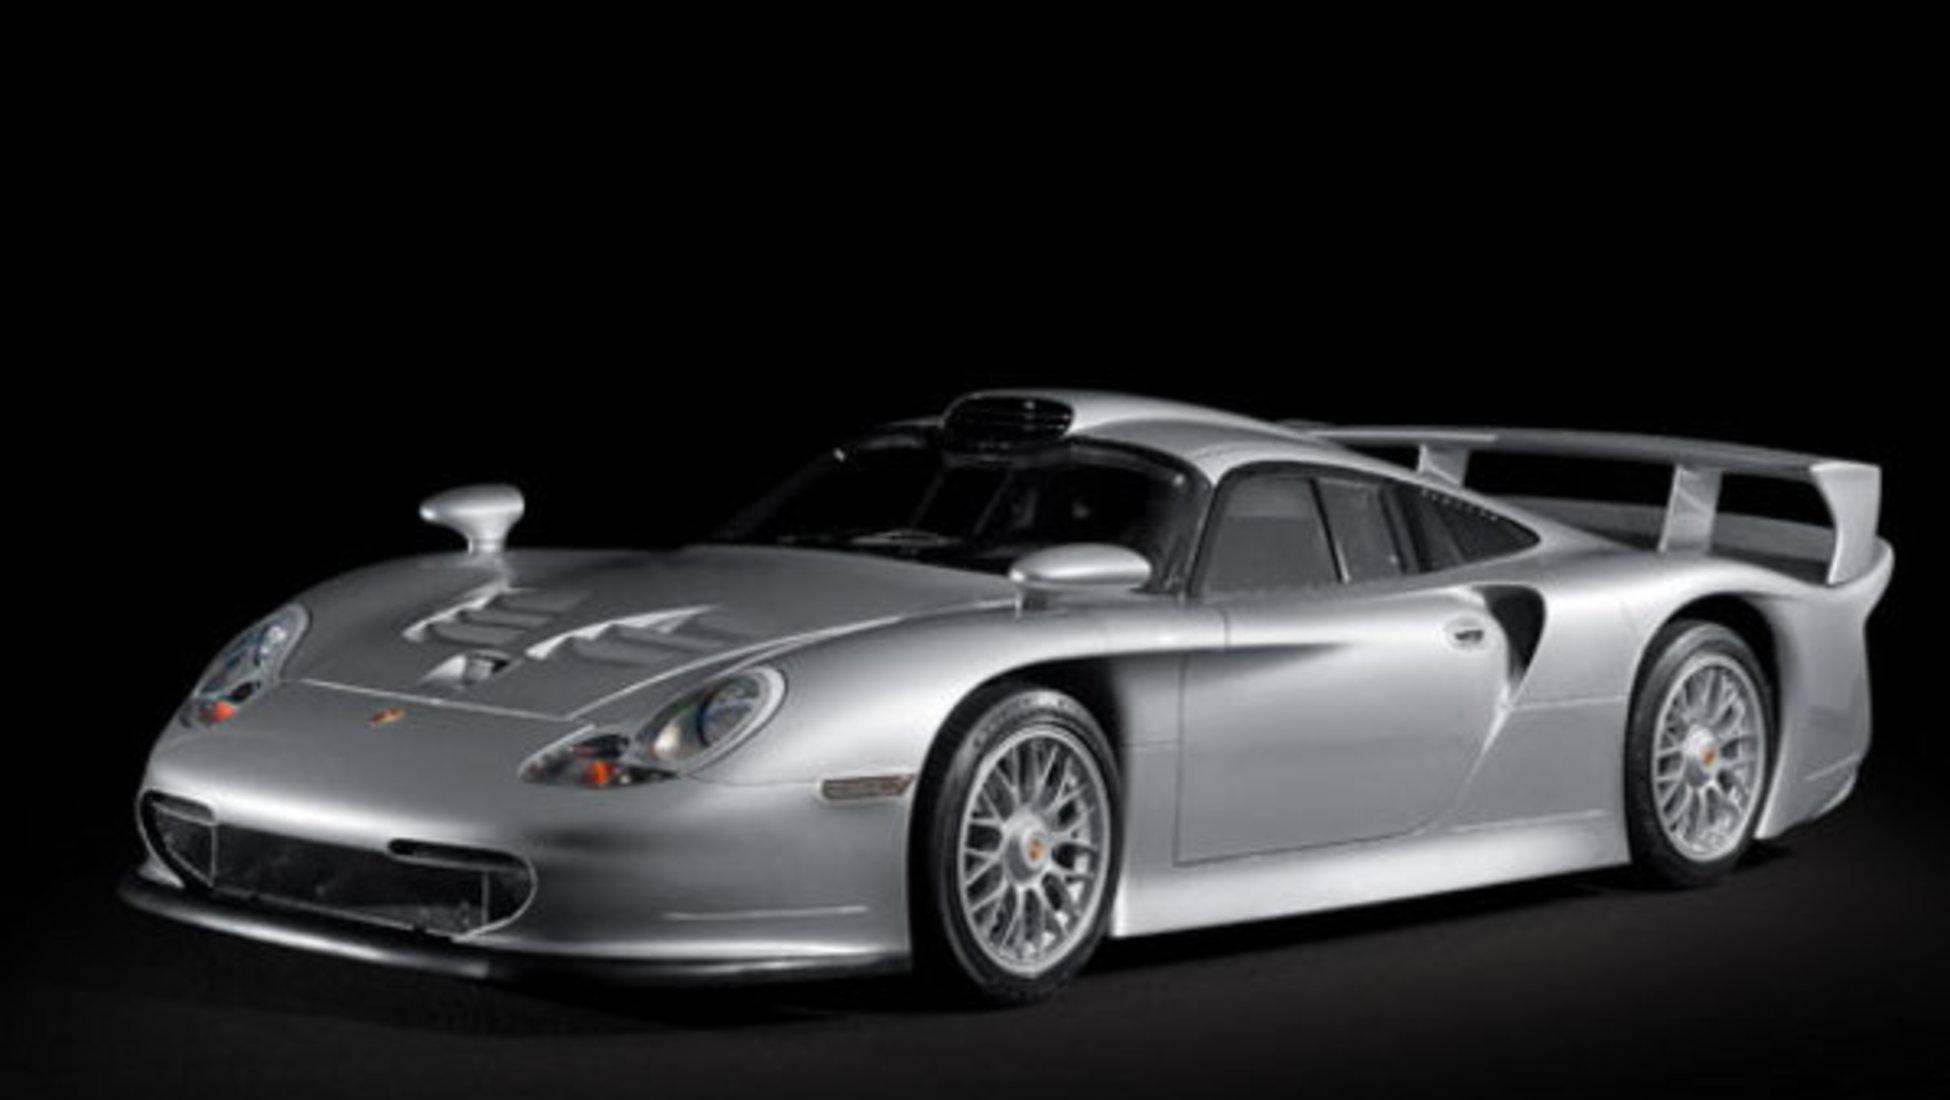 42629-6d20b3e4f8967afbec3a505db52aa4670694421a-story_inline_image Remarkable Porsche 911 Gt1 (996) Road Car Cars Trend